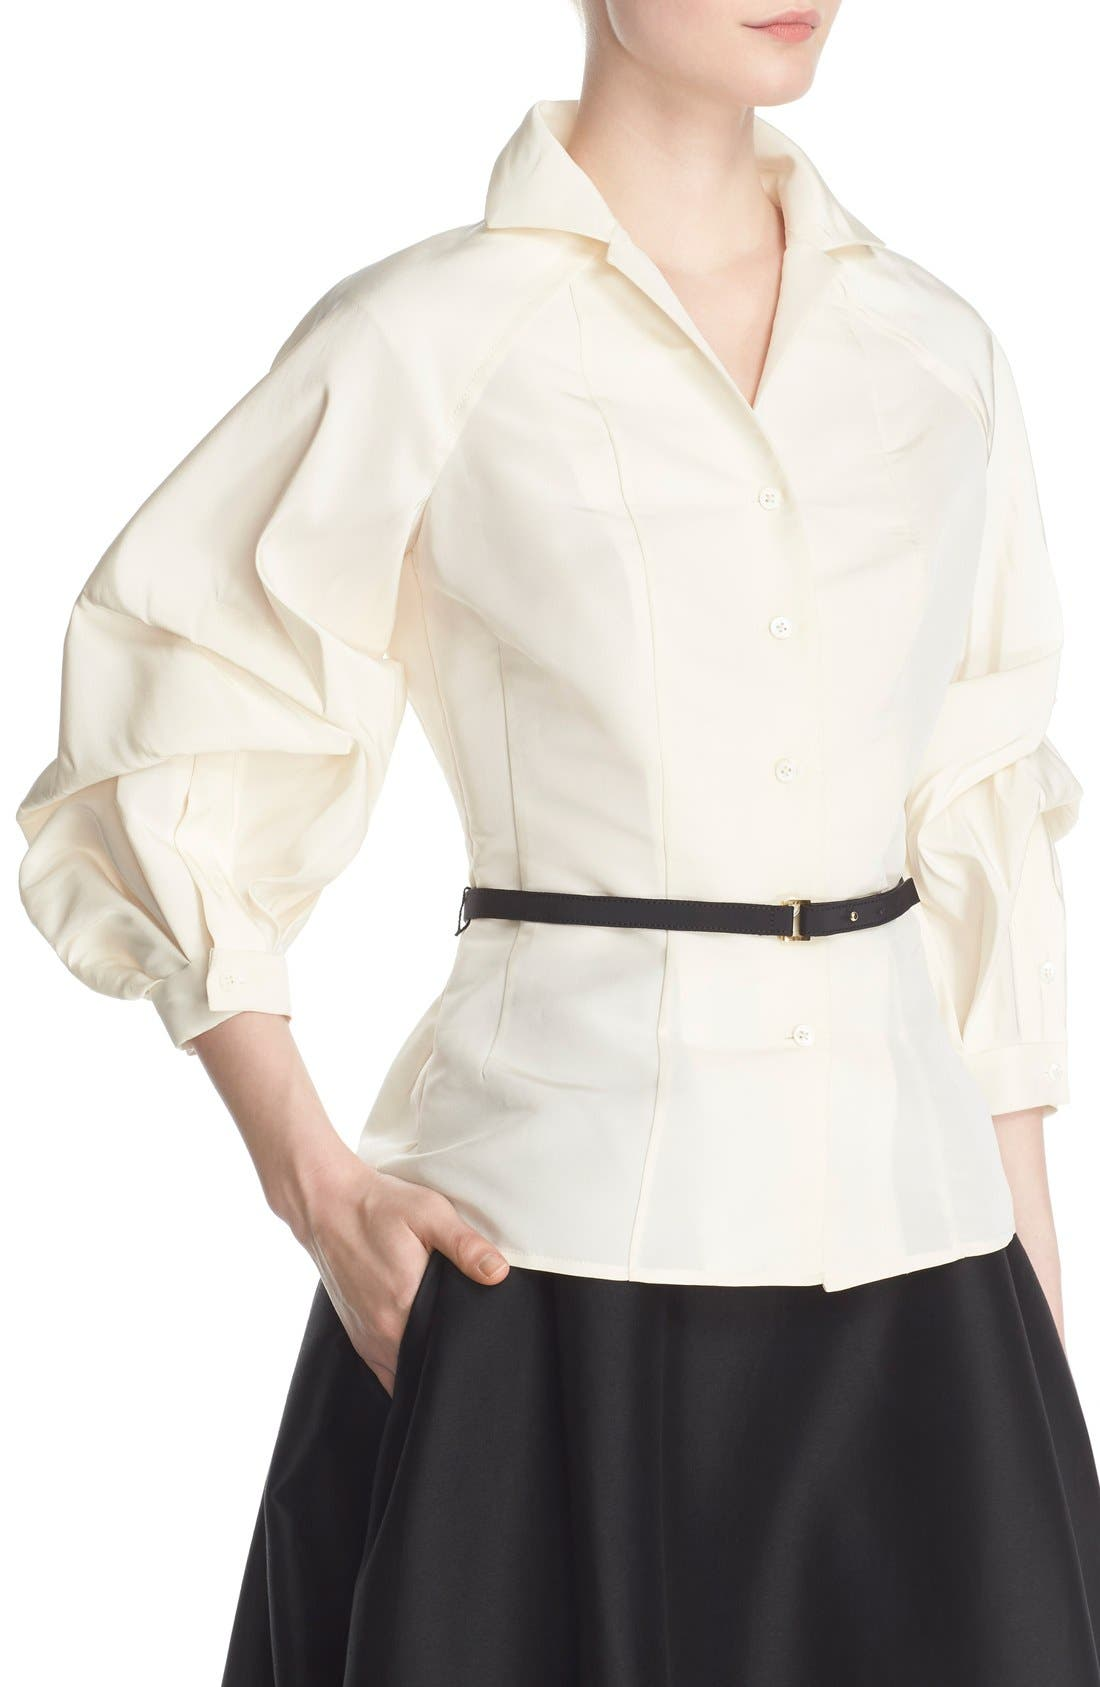 Alternate Image 1 Selected - Carolina Herrera Full Sleeve Silk Blouse